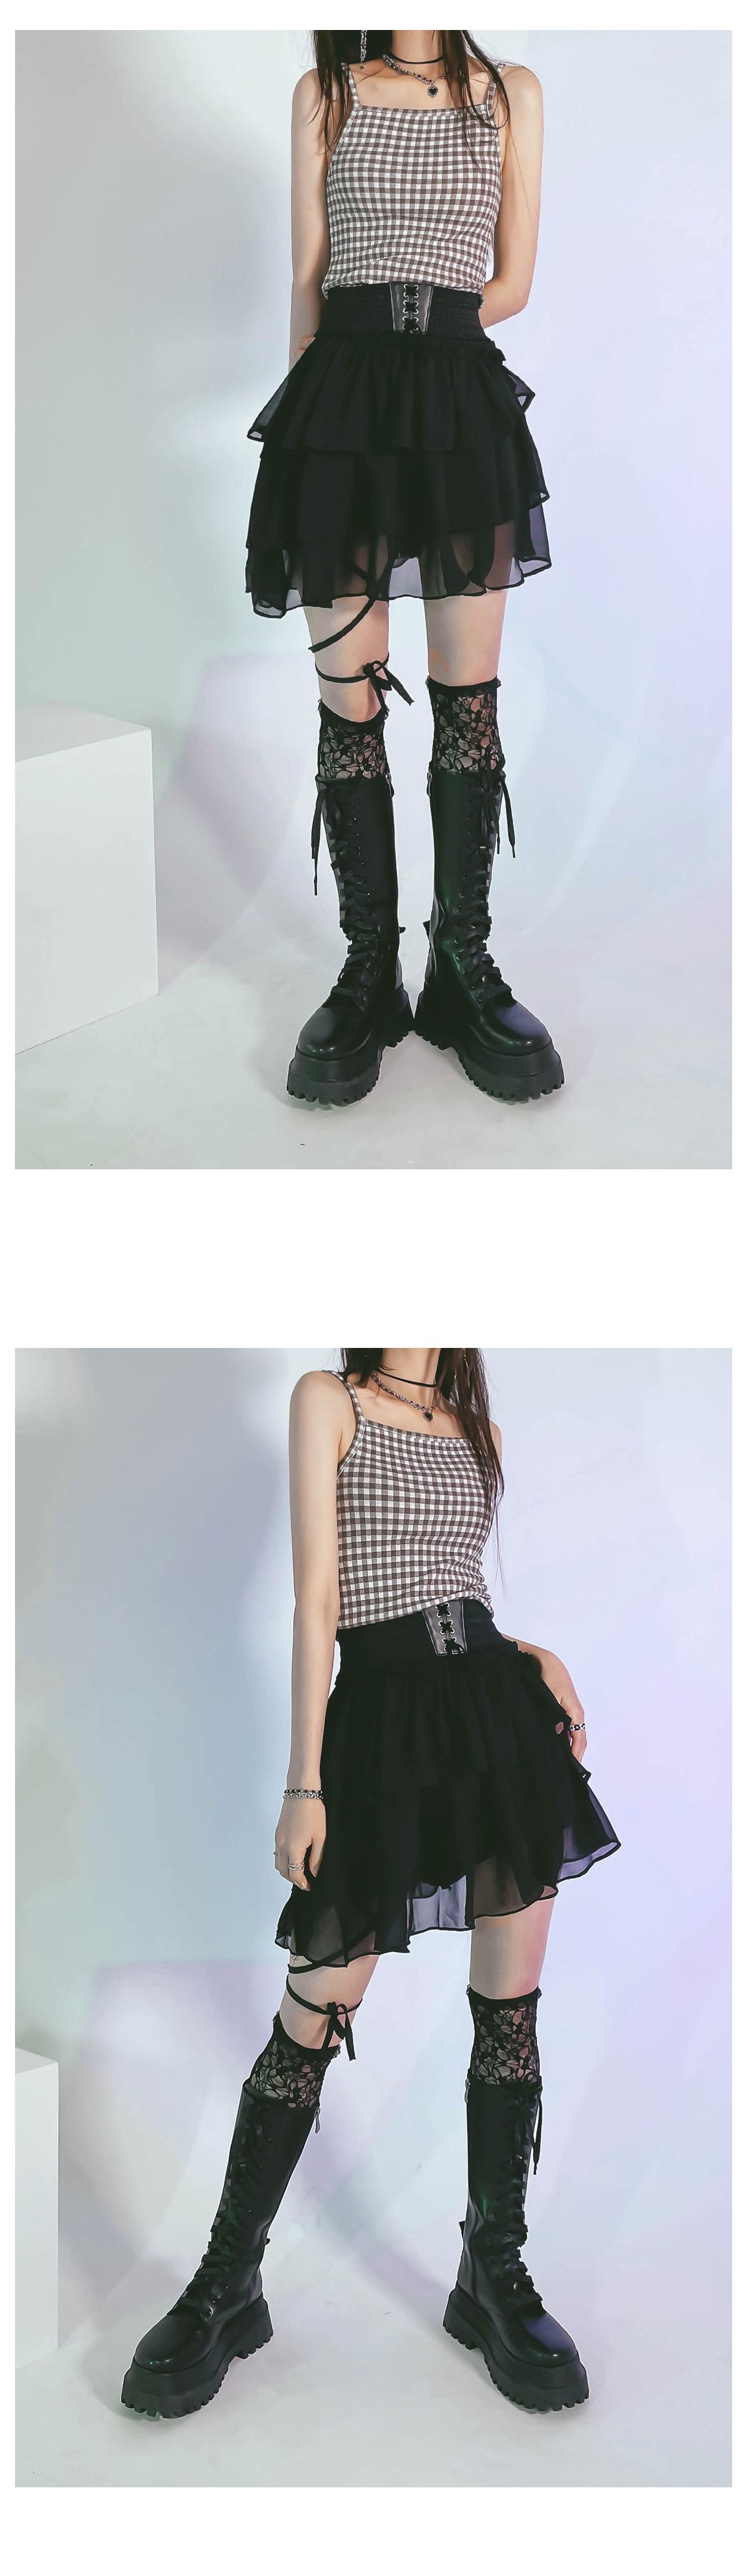 strap leary unbalance skirt